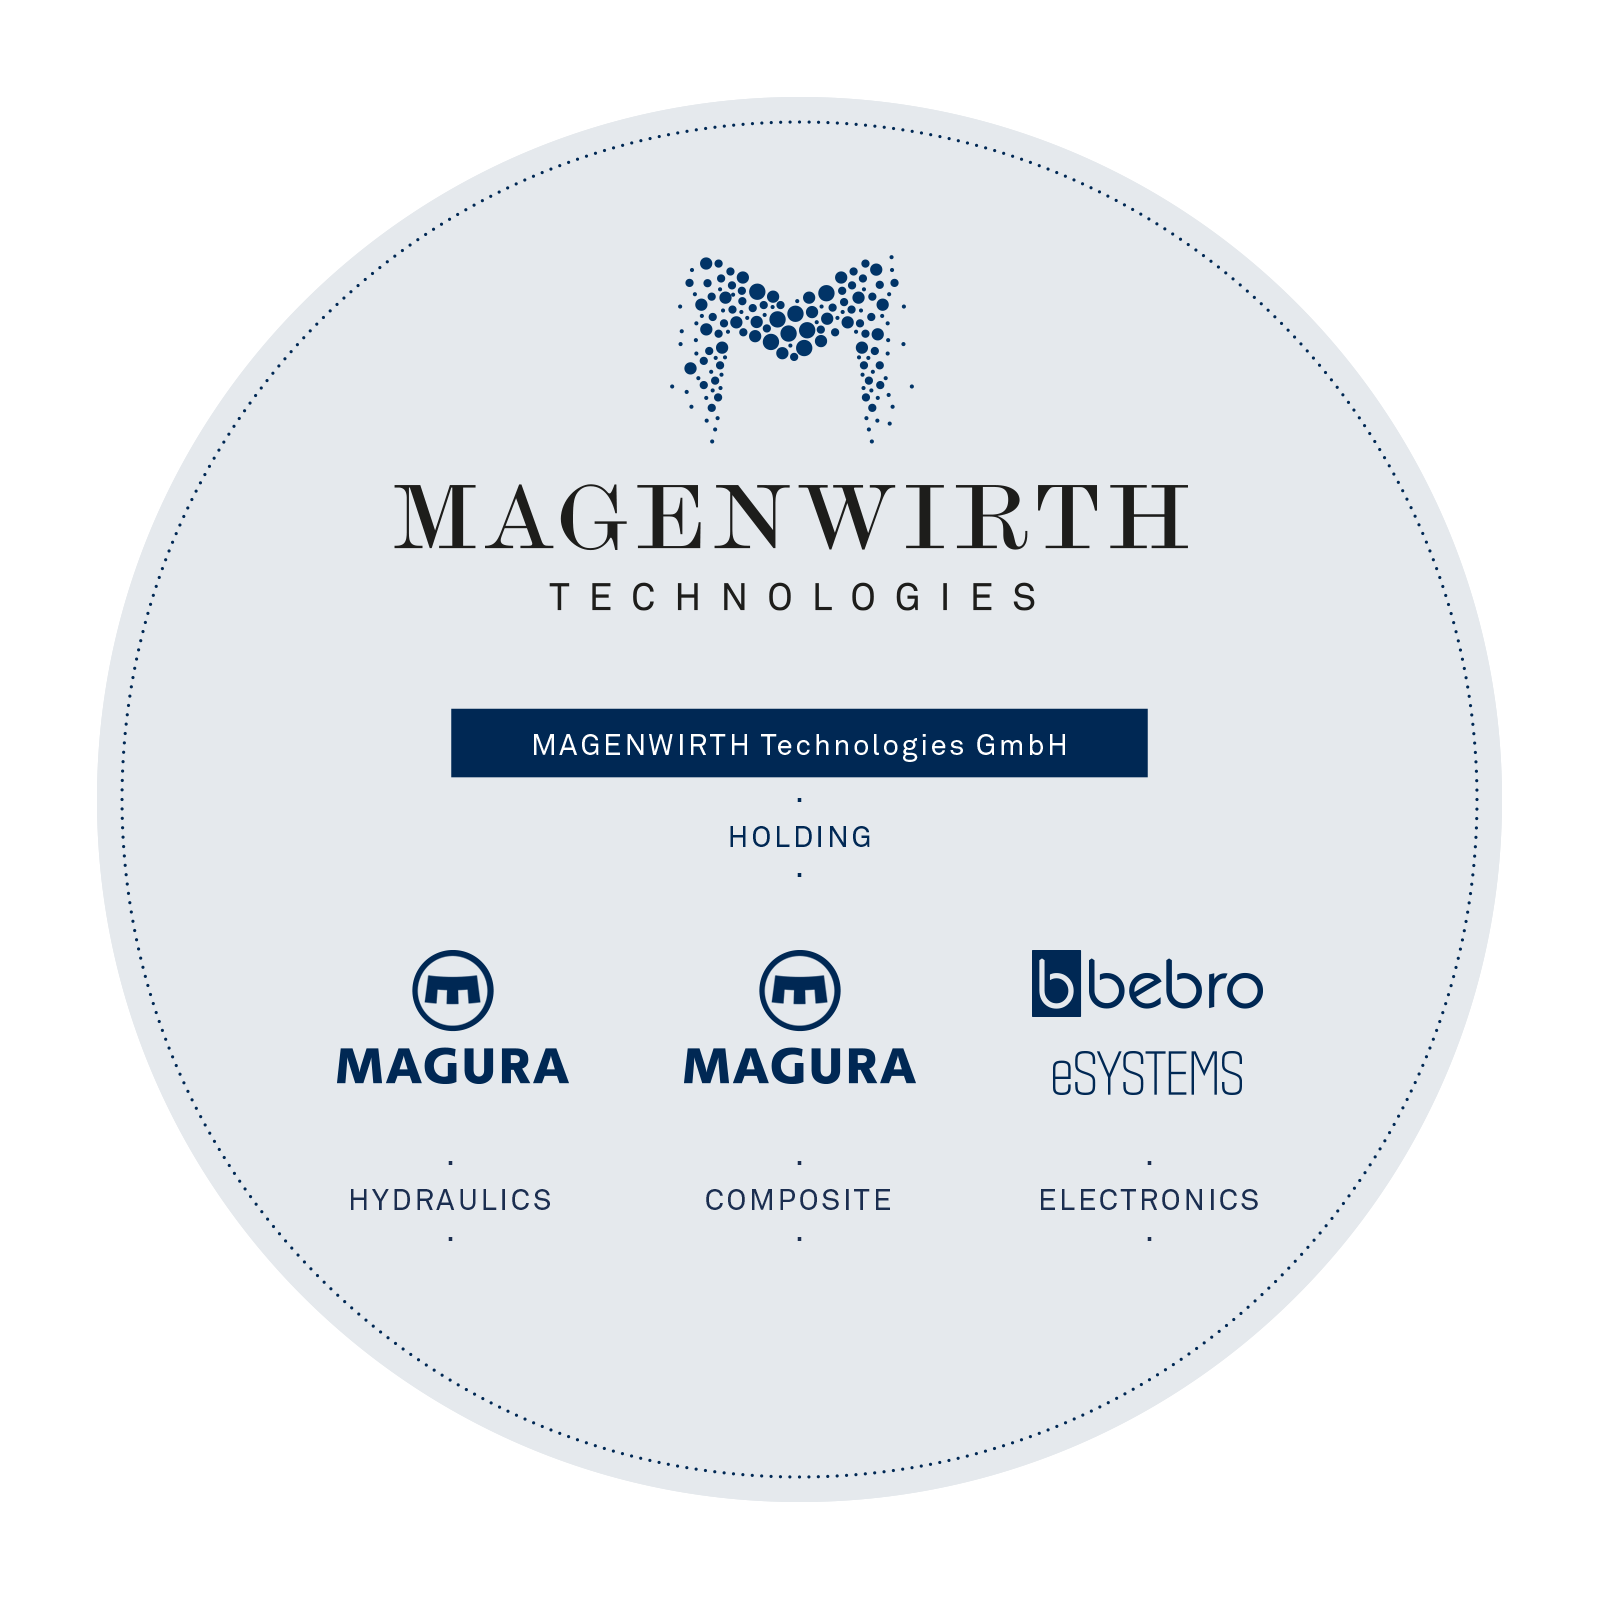 Magenwirth Innovations